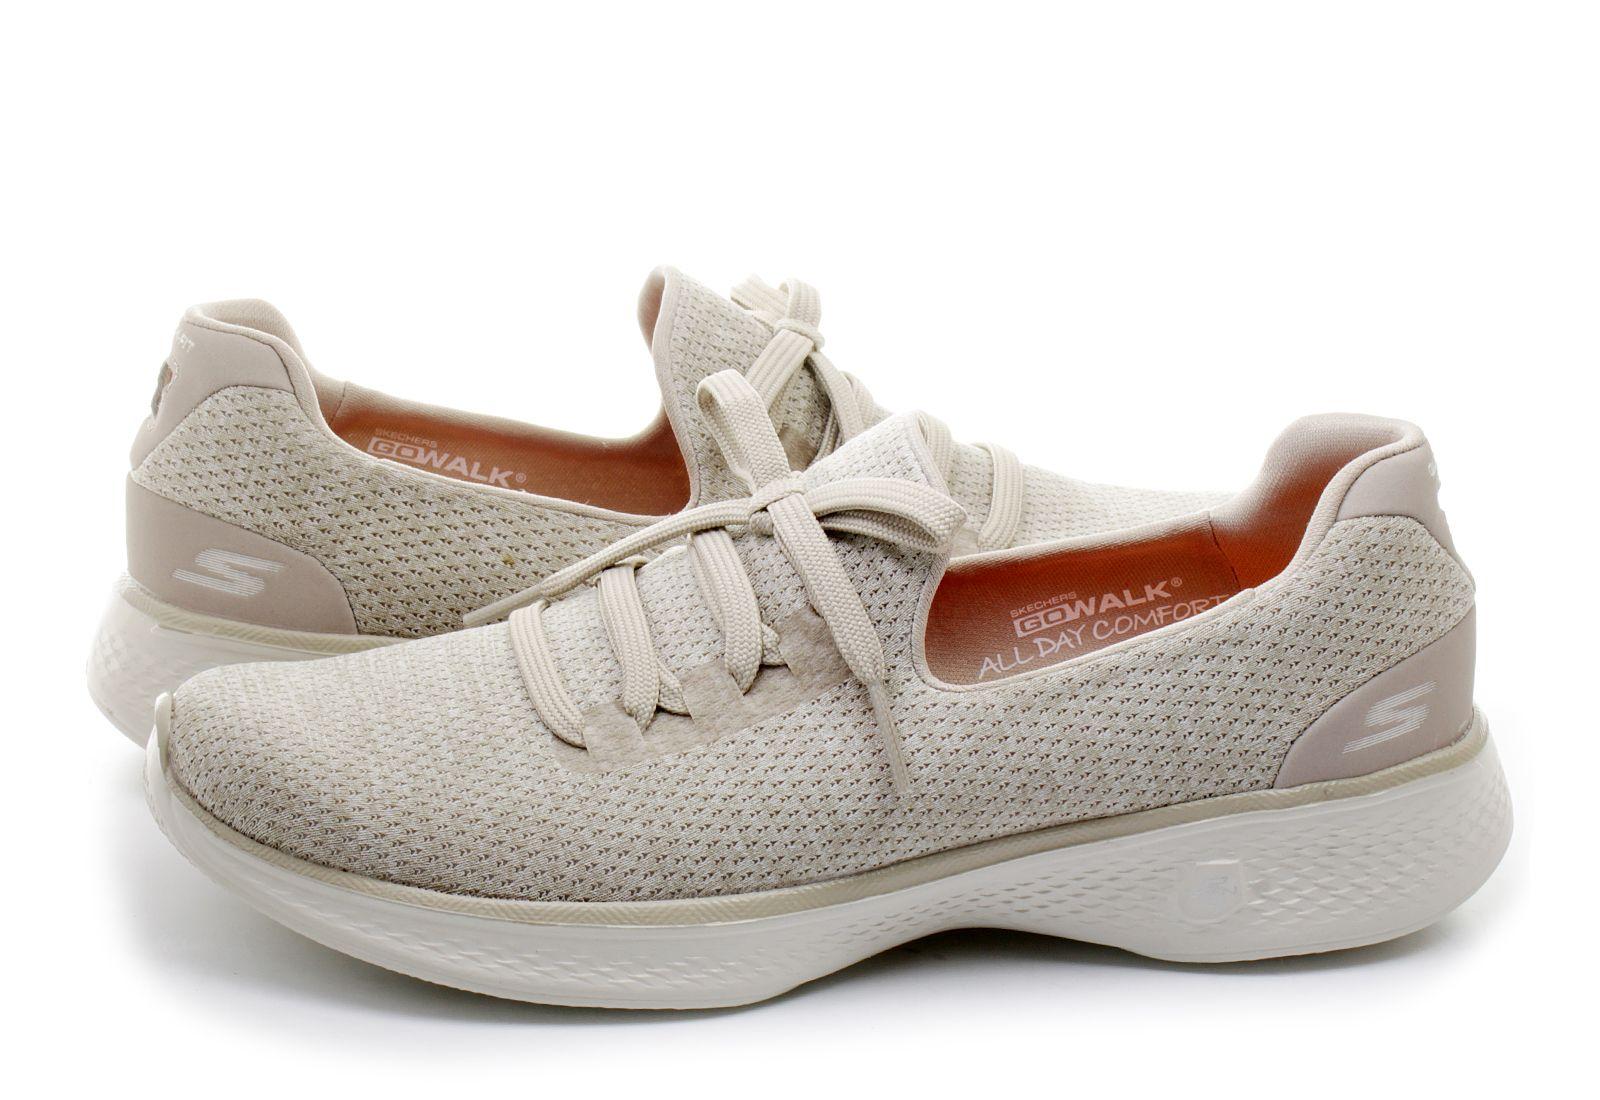 Skechers Cipő - All Day - 14901-tpe - Office Shoes Magyarország 3ce81407c9